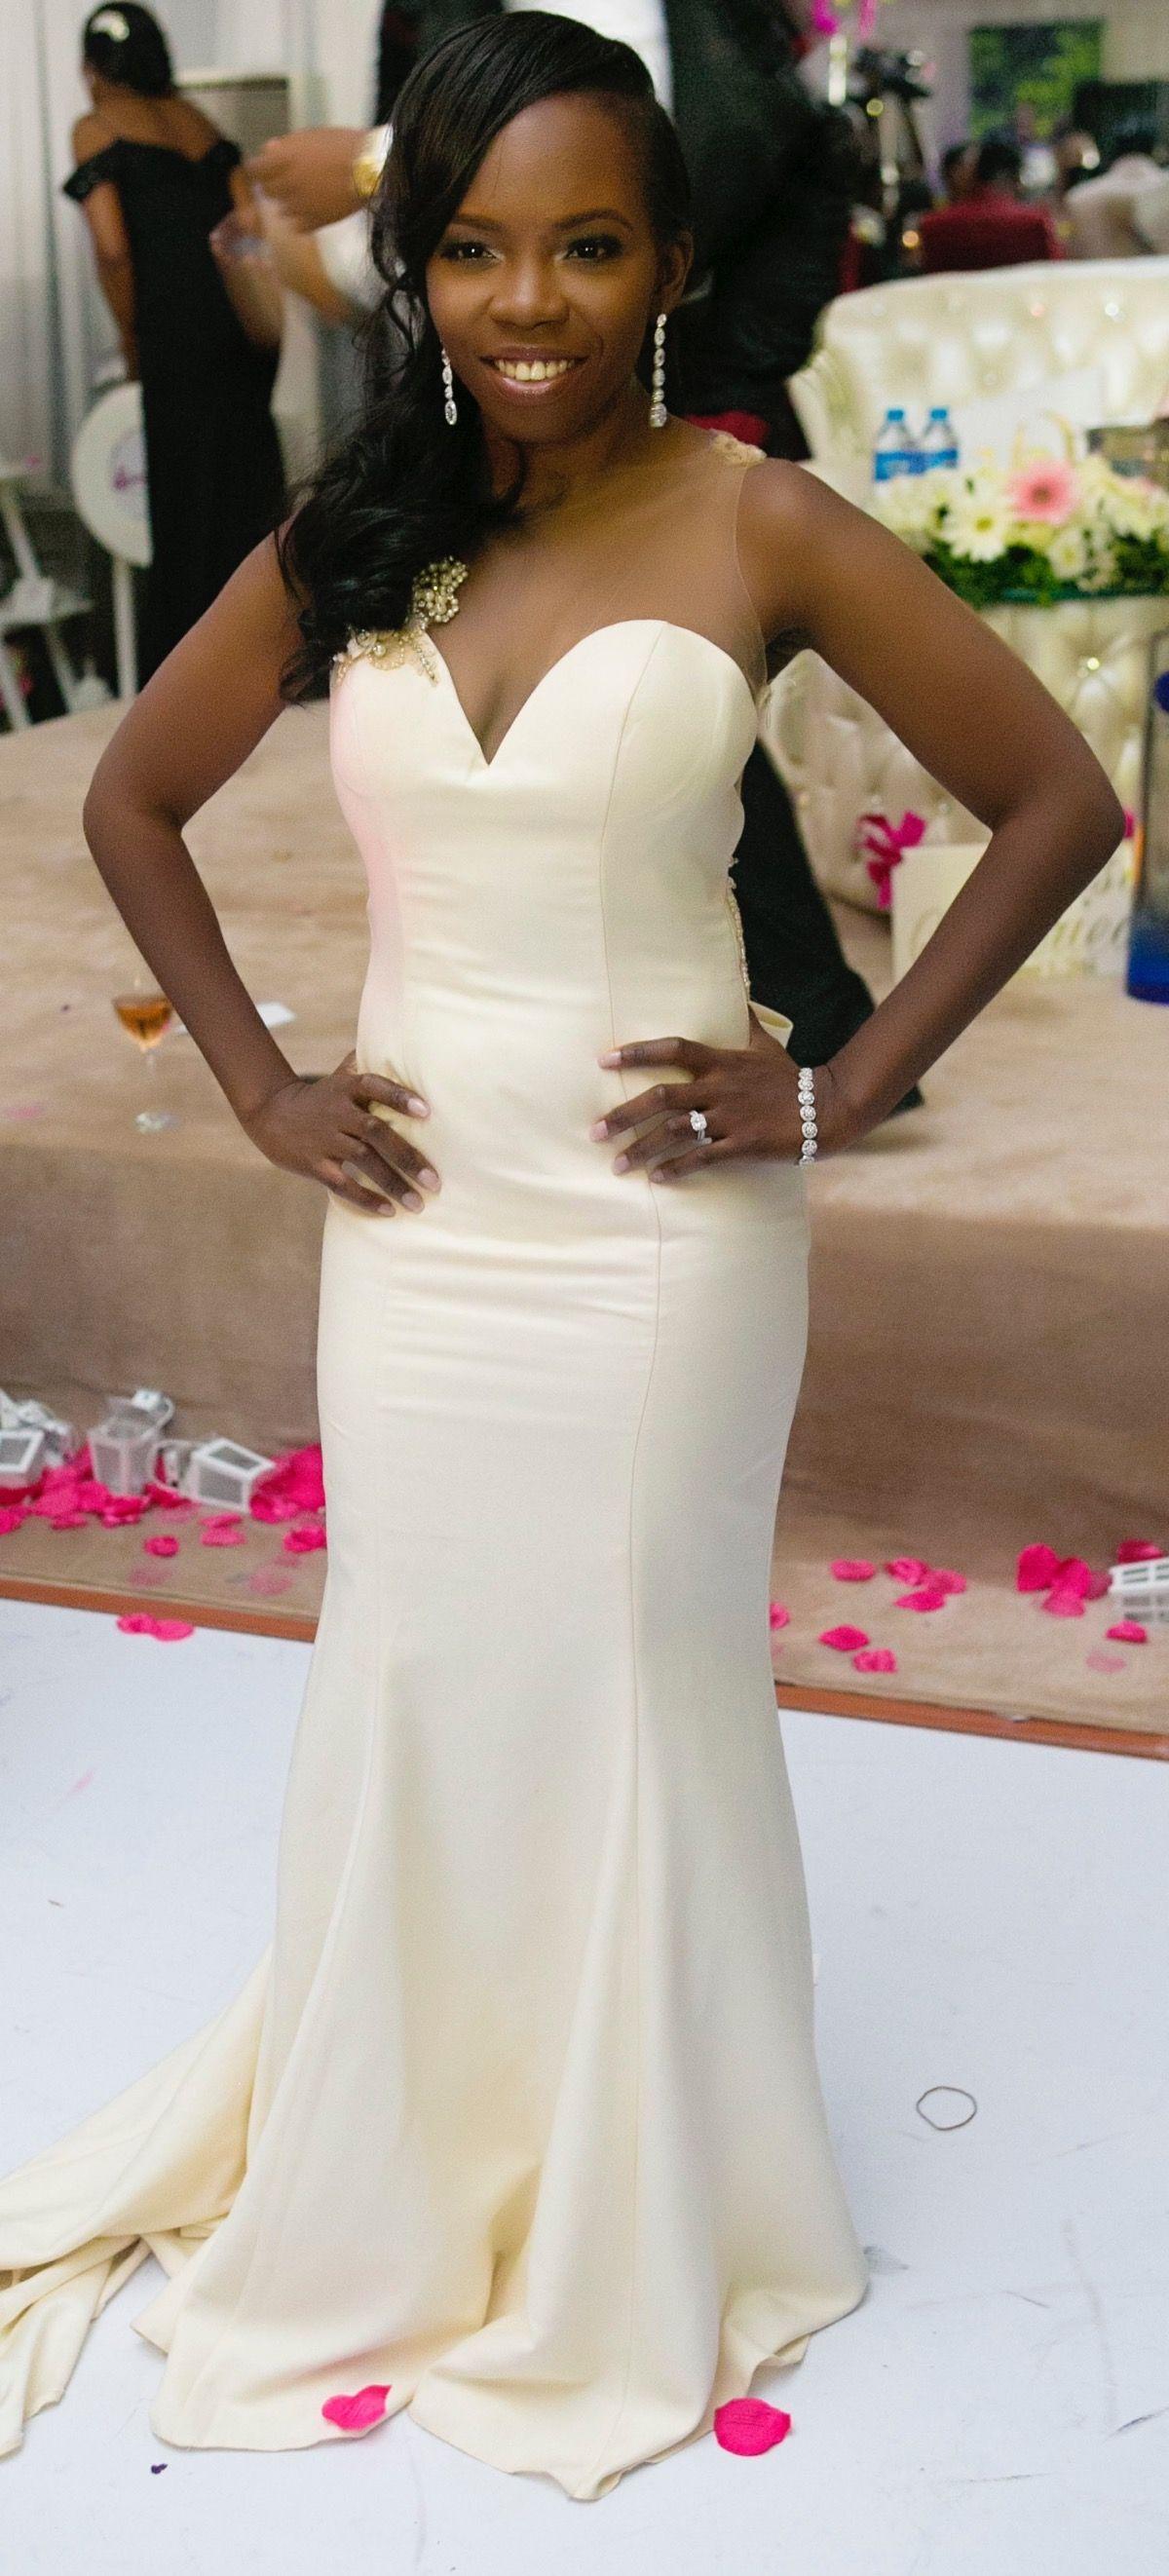 Lace dress nigeria  Modern Lagos Wedding at Ruby Gardens Nigeria  Wedding and Weddings